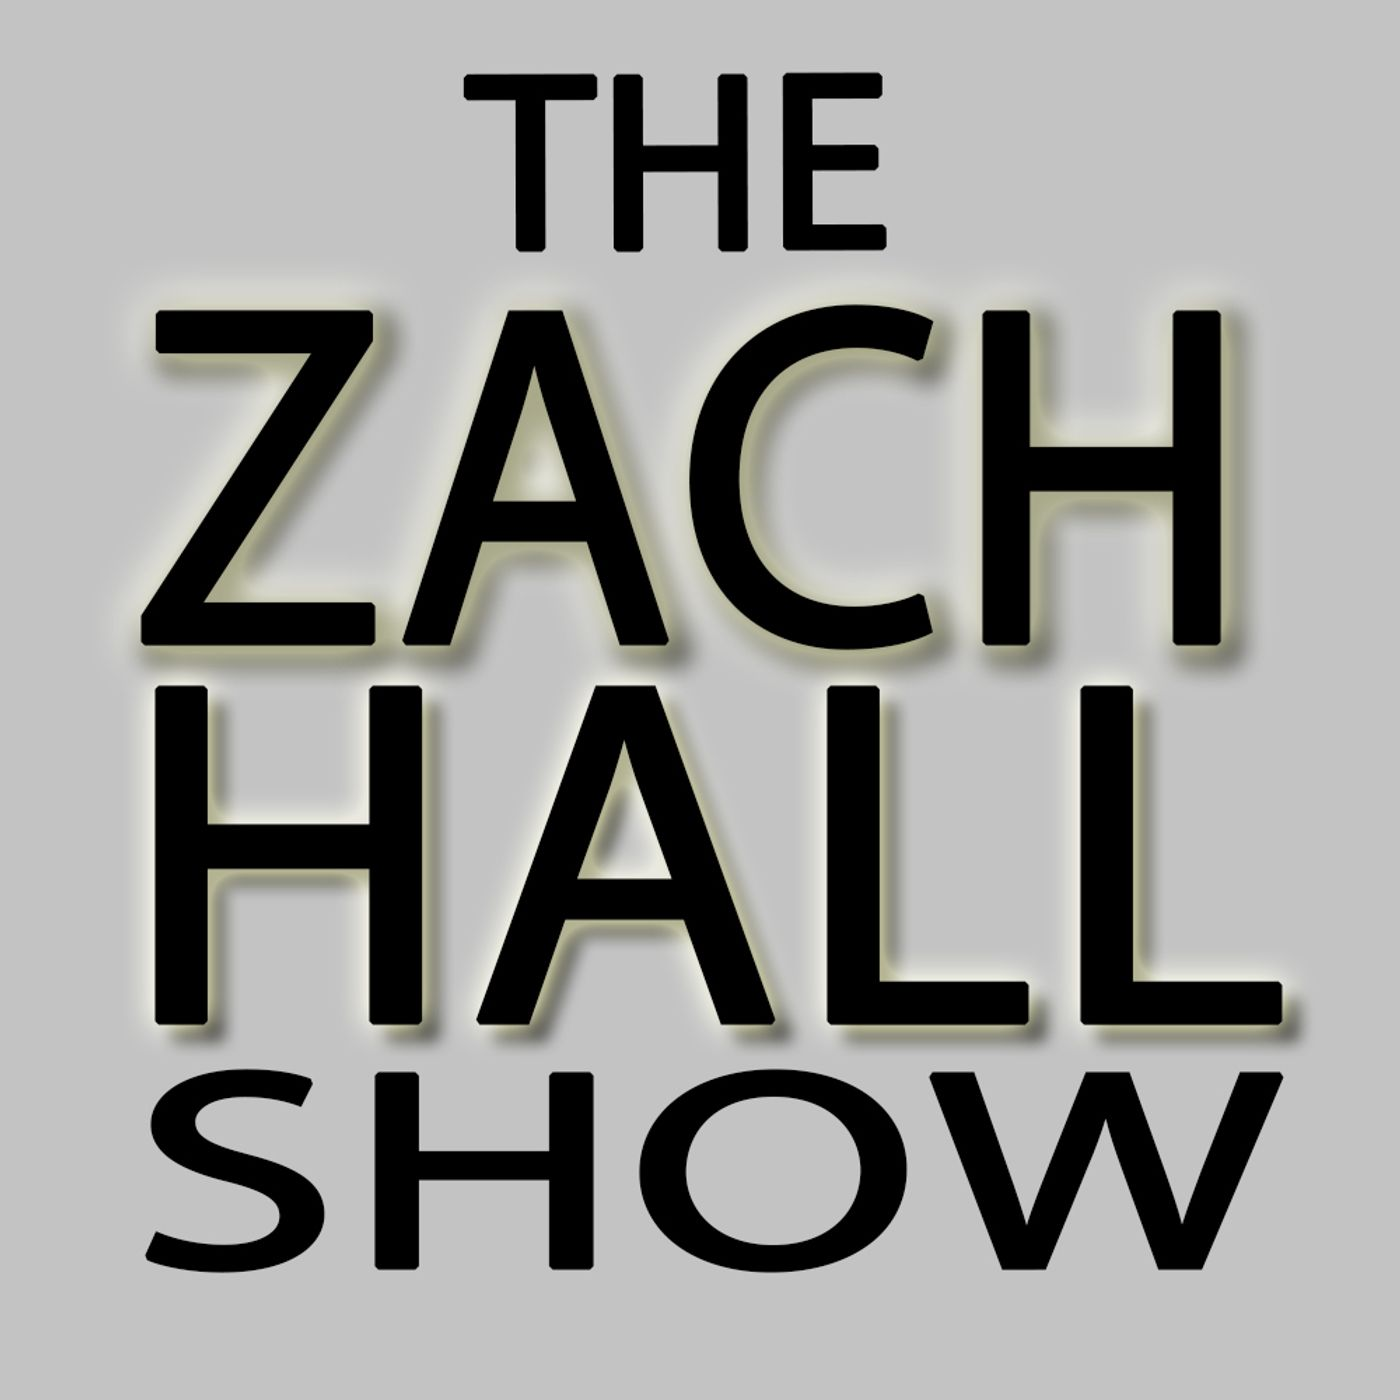 The Zach Hall Show